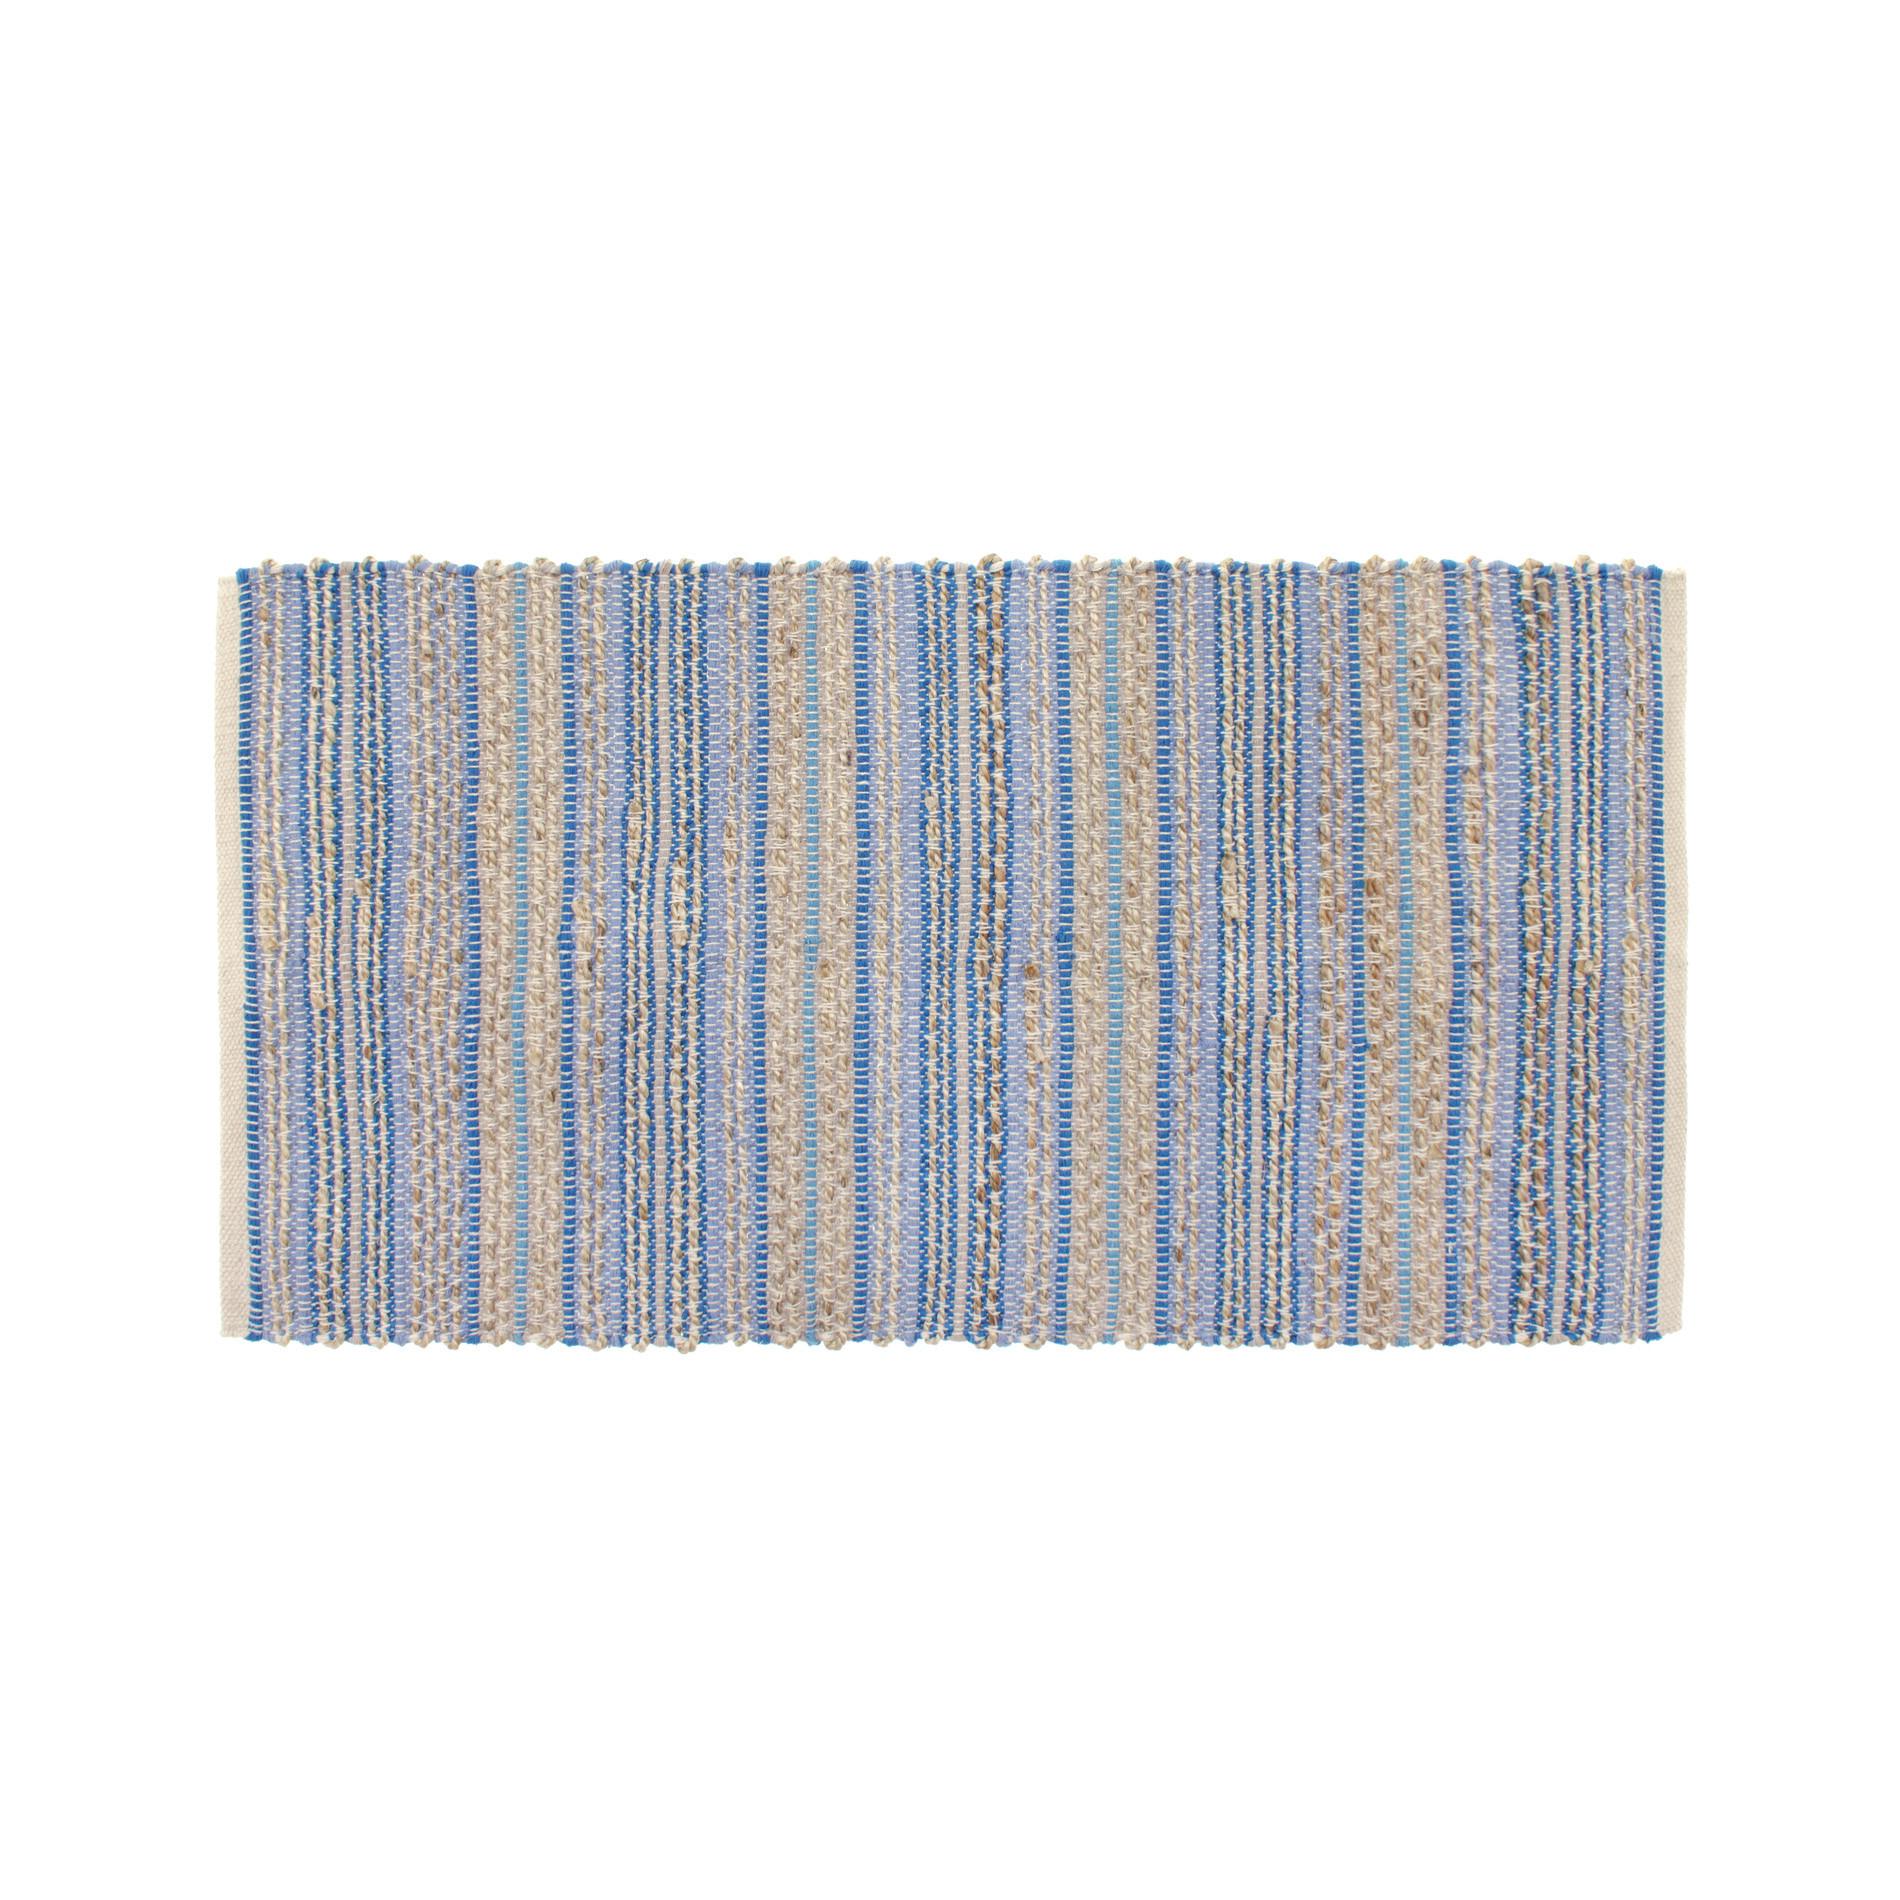 Tappeto cucina cotone e juta a righe, Blu, large image number 0